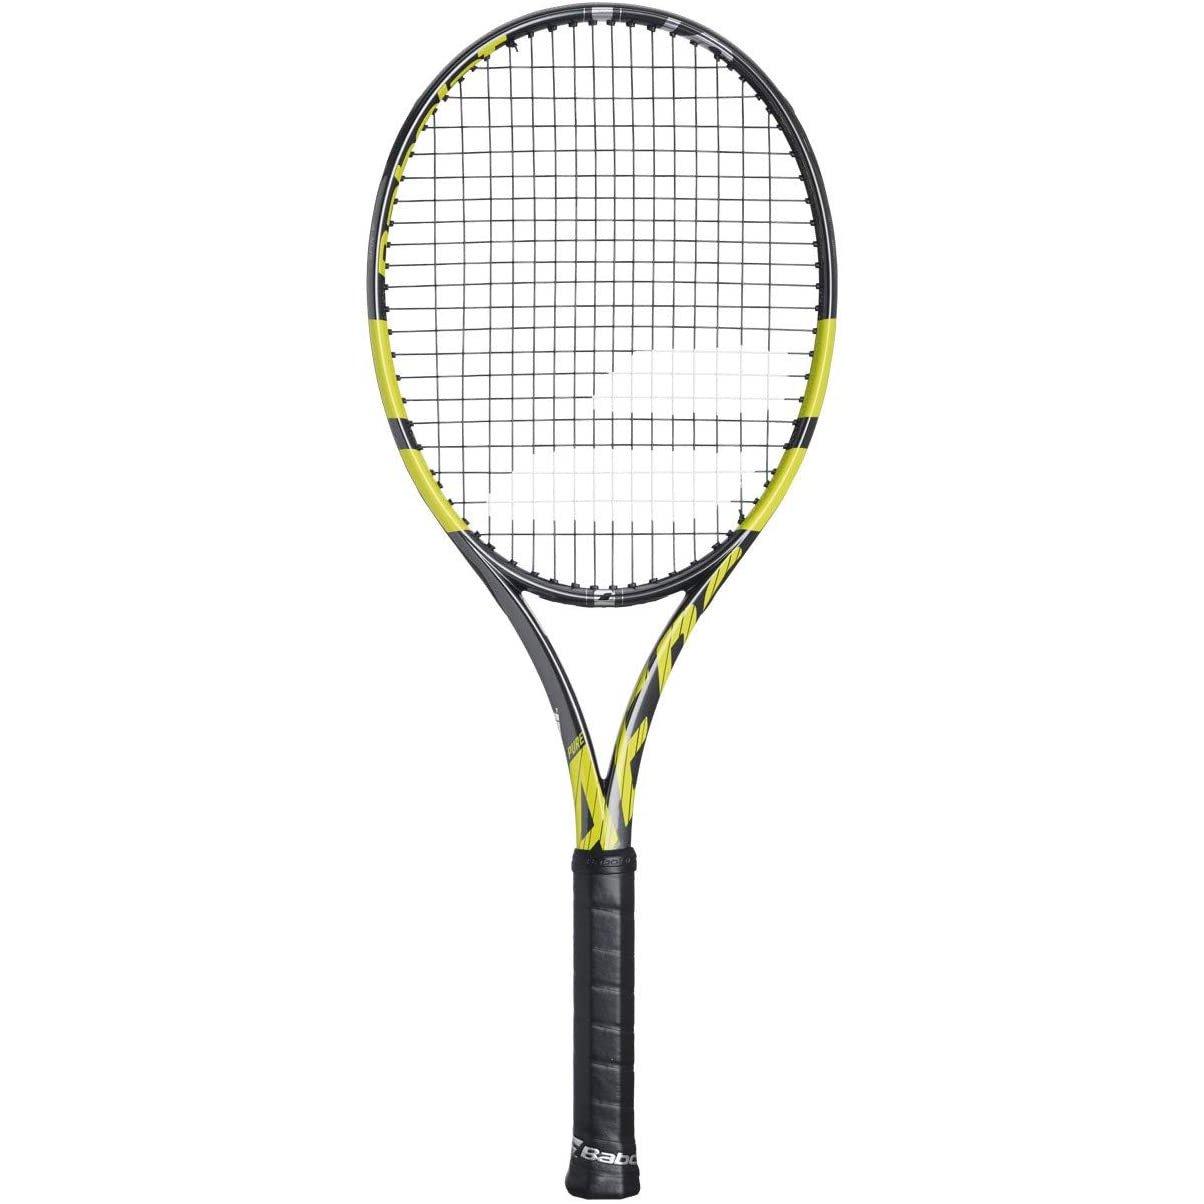 Babolat Tennis Racket – Pure Aero VS